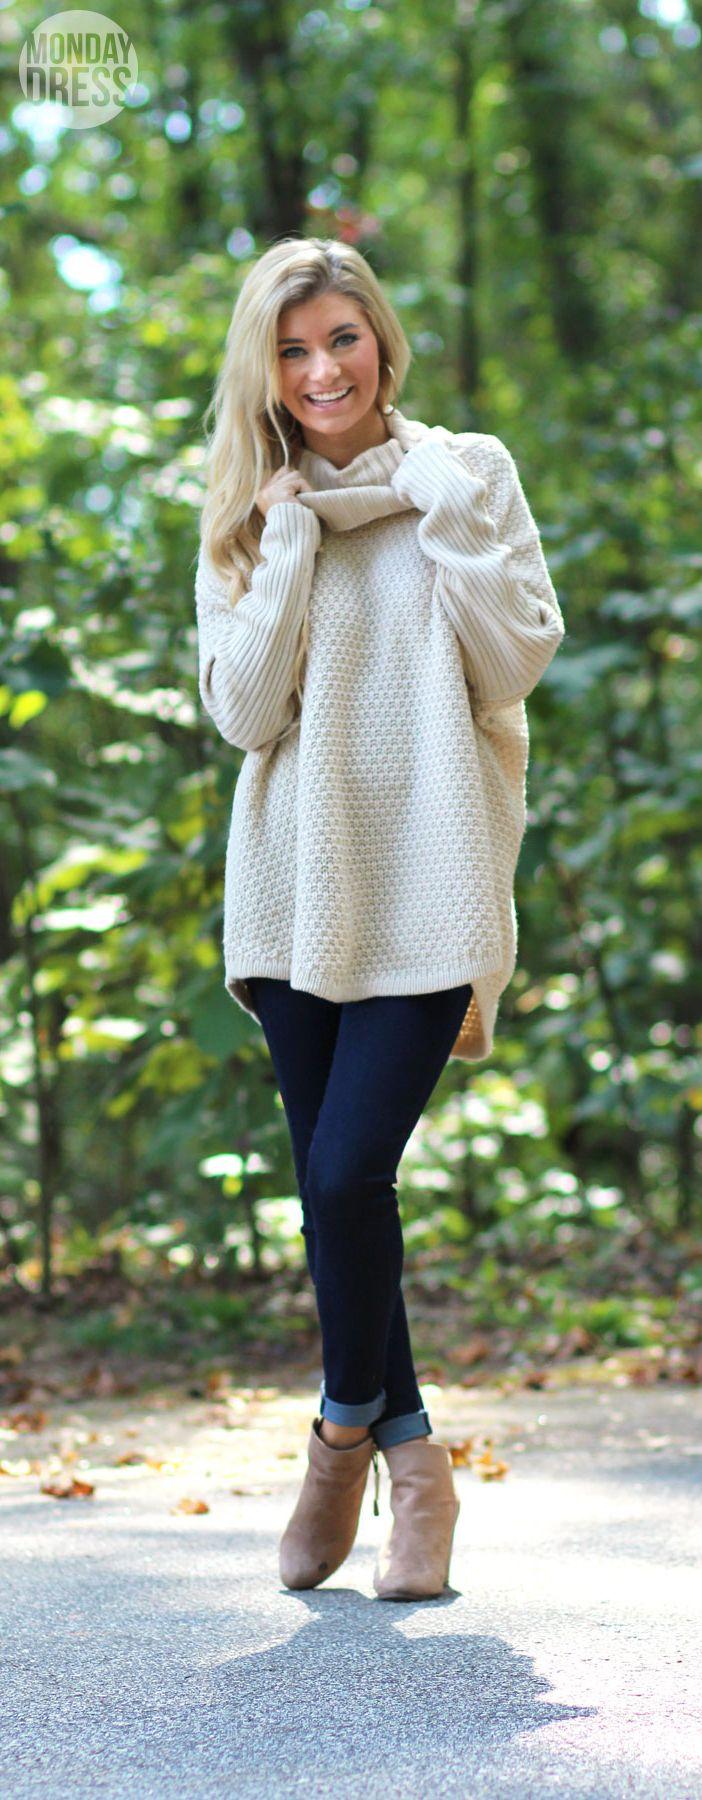 Bundle Up Babe Sweater | Monday Dress